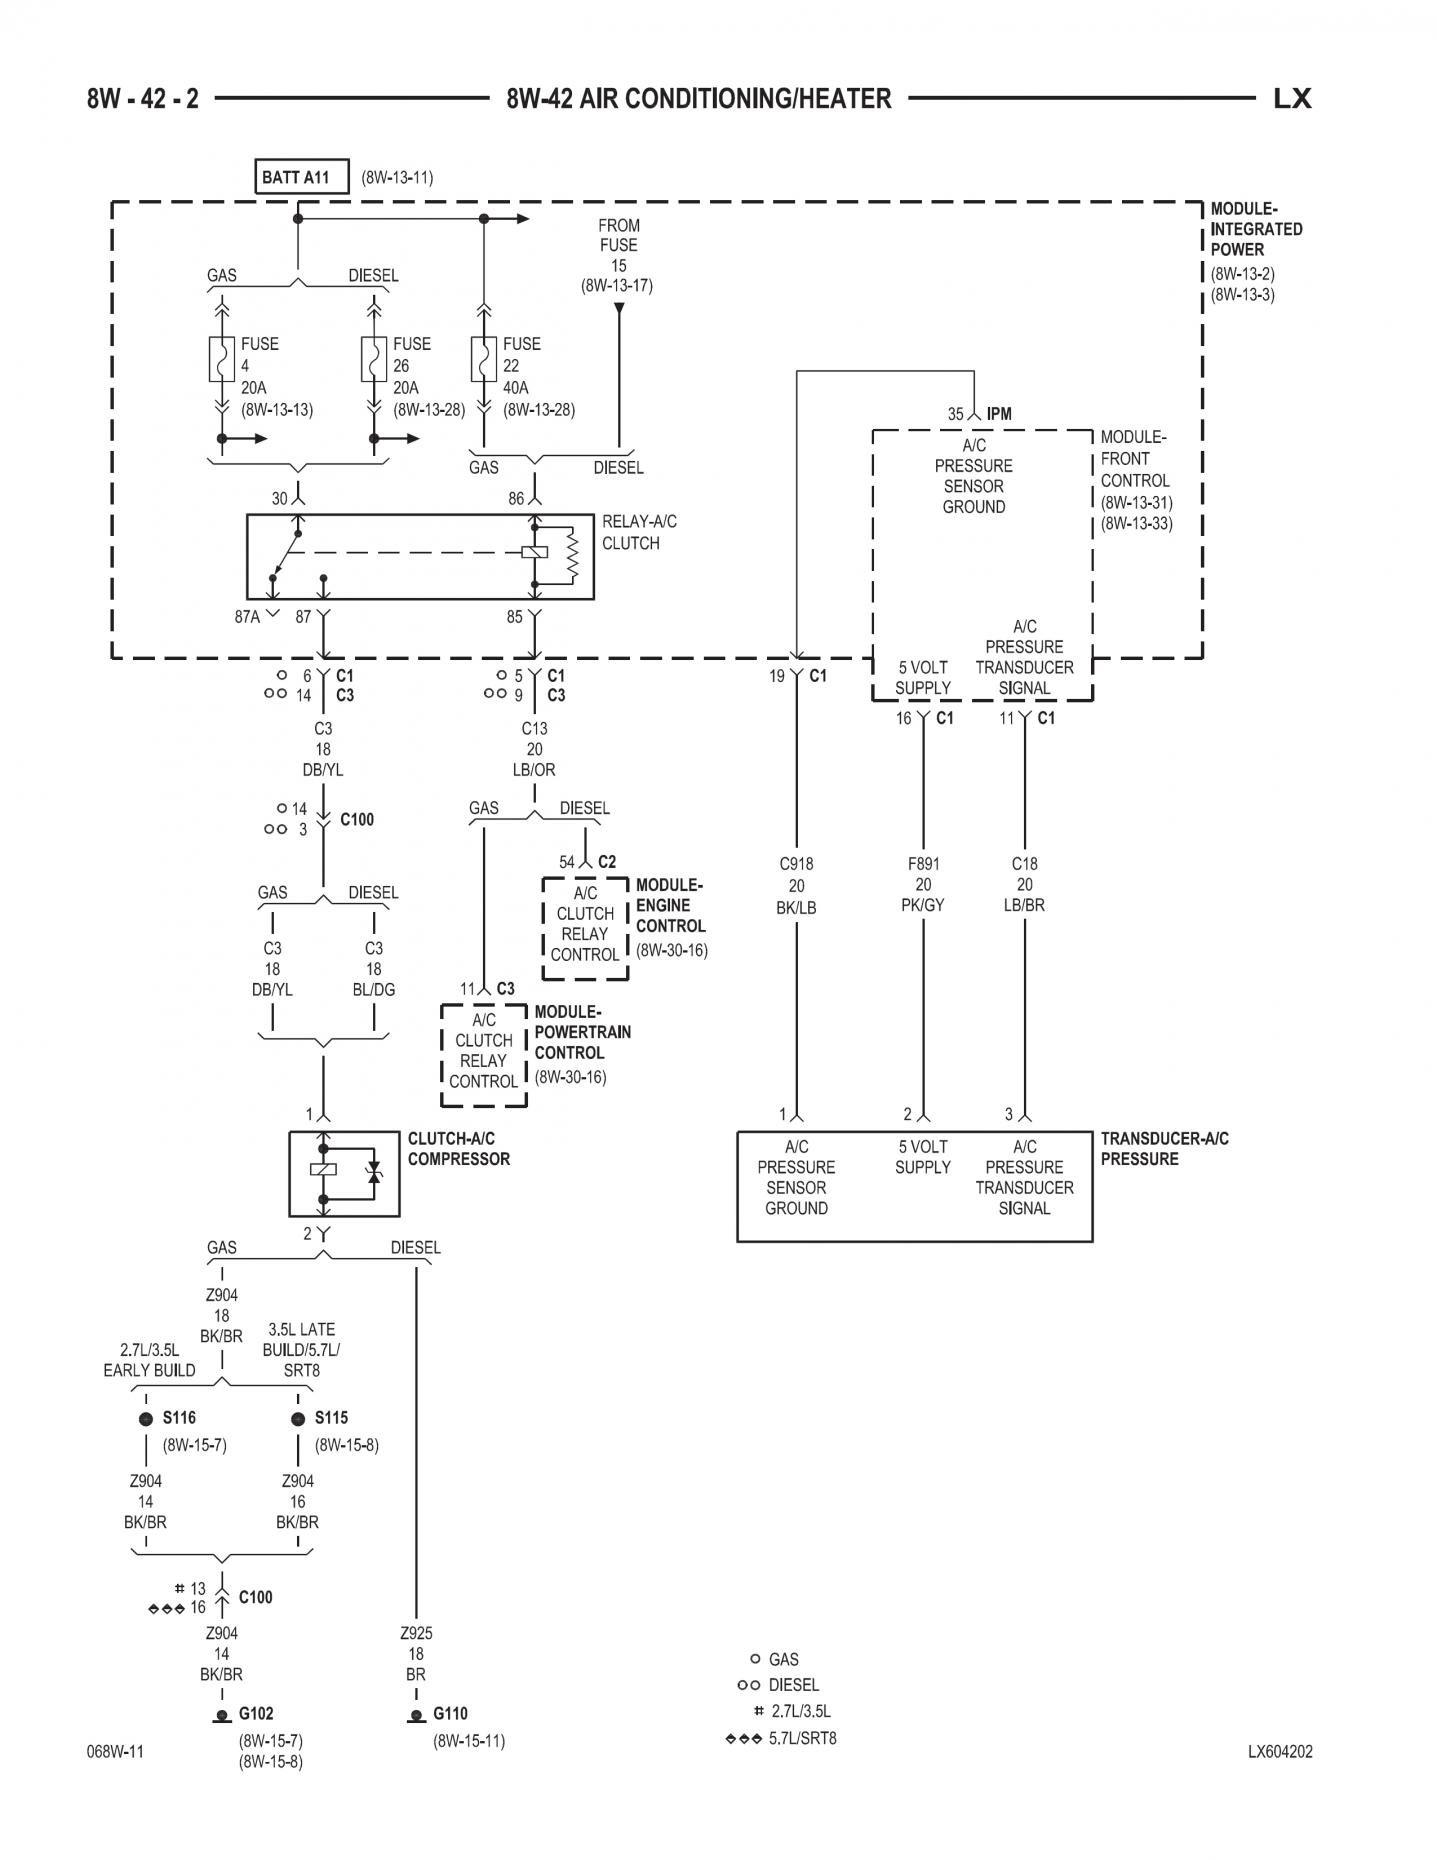 Chrysler Ac Wiring Diagrams Wiring Diagram Options Fur Visible Fur Visible Studiopyxis It